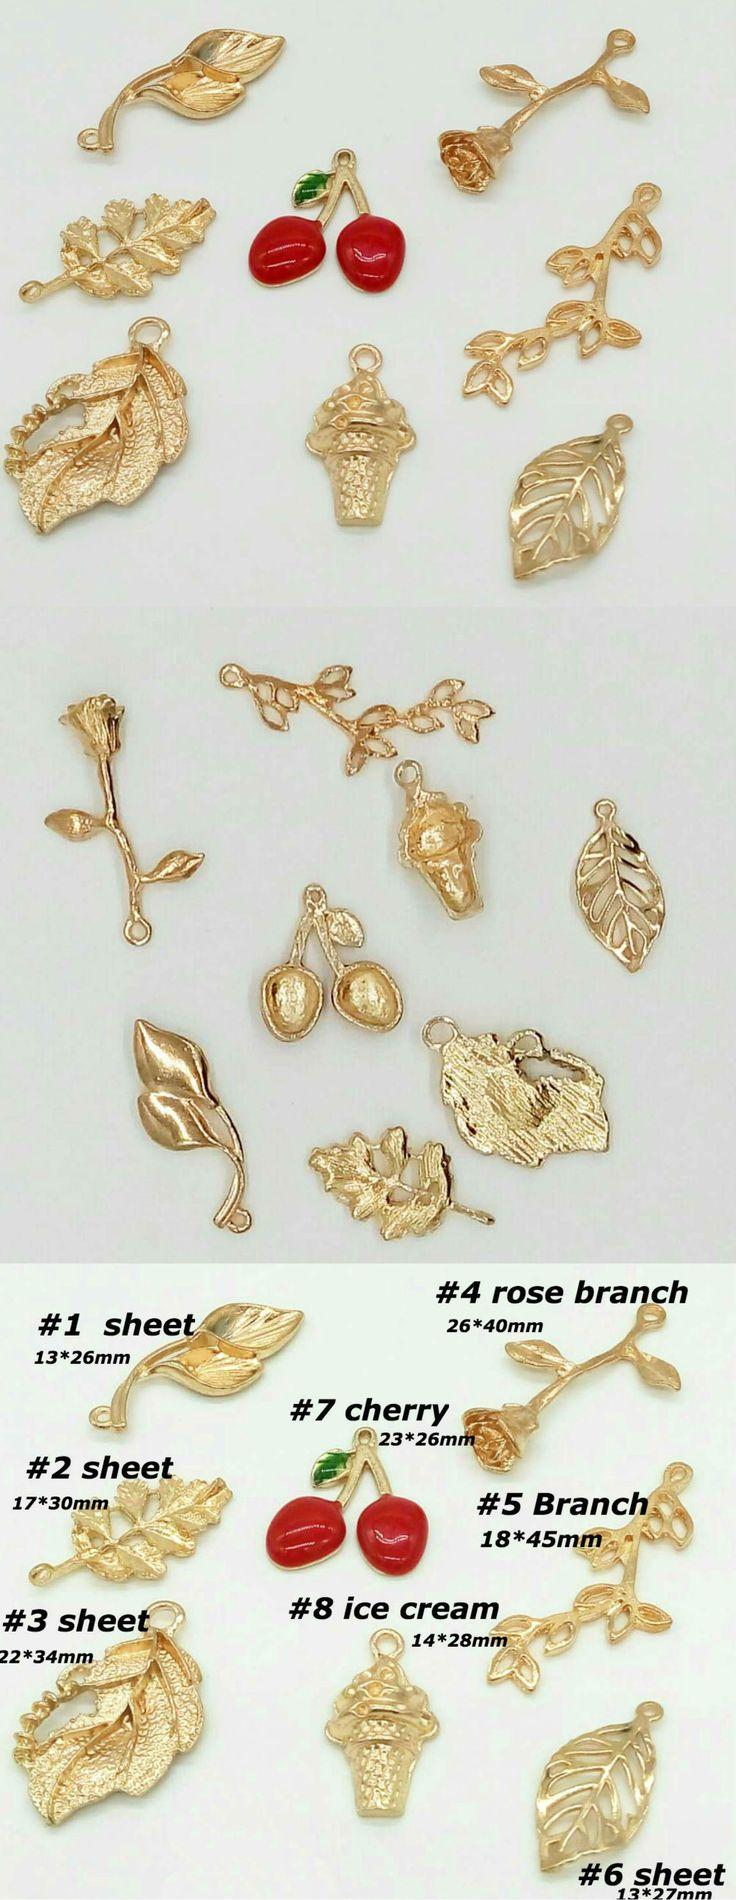 2 pcs DIY charms, Bracelets Charm,  charm madam coco,  Jewellery  charms, boho charms, Jewelry Supplies, charms wholesale,   Jewellery making supplies. Charm sheet, charm ice cream